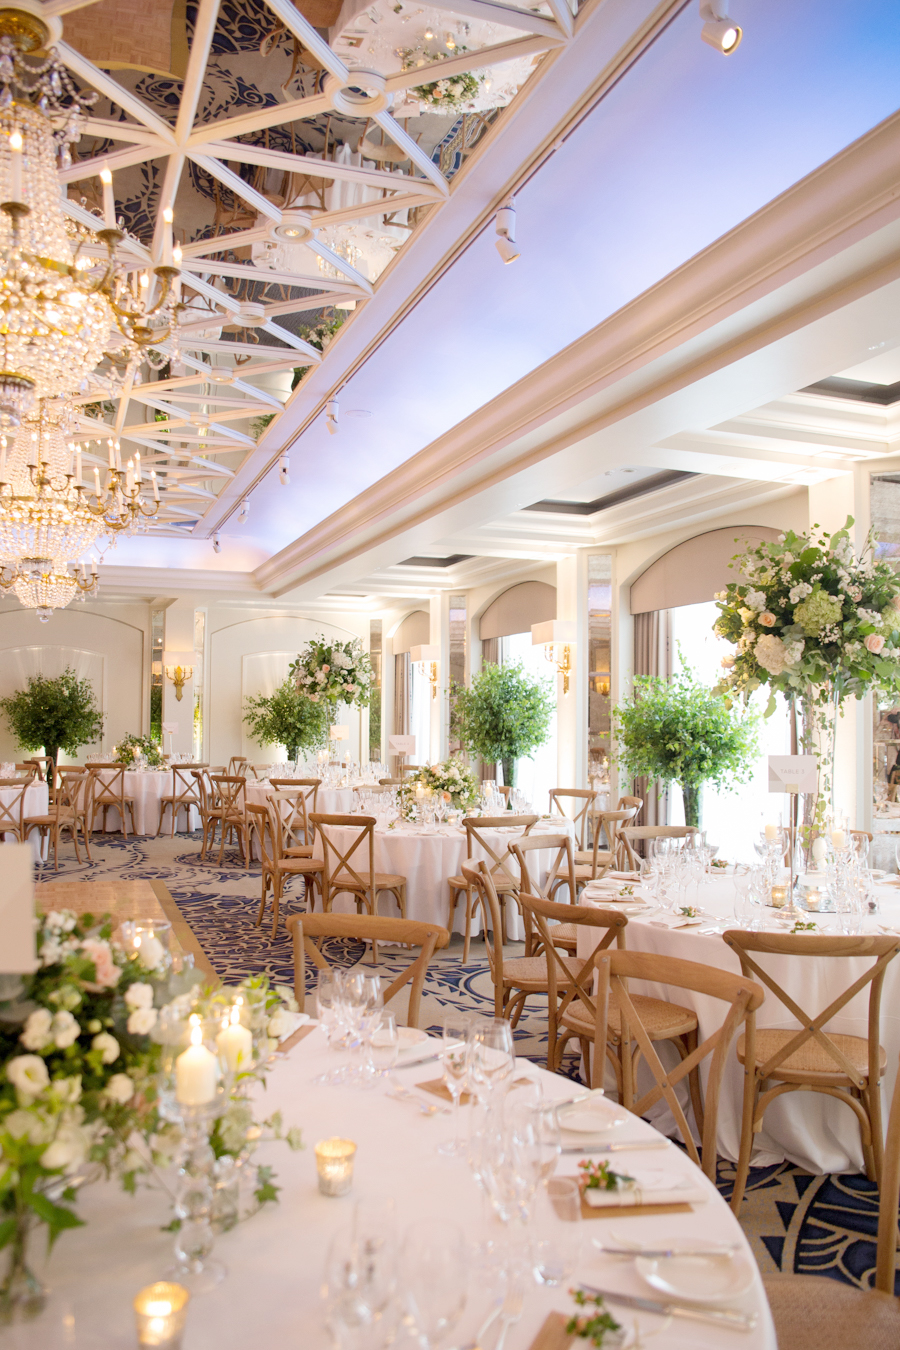 F | The Berkeley Wedding | London Wedding | Luxury Wedding Planner London | Lamare London | Claire Graham Photography.jpg